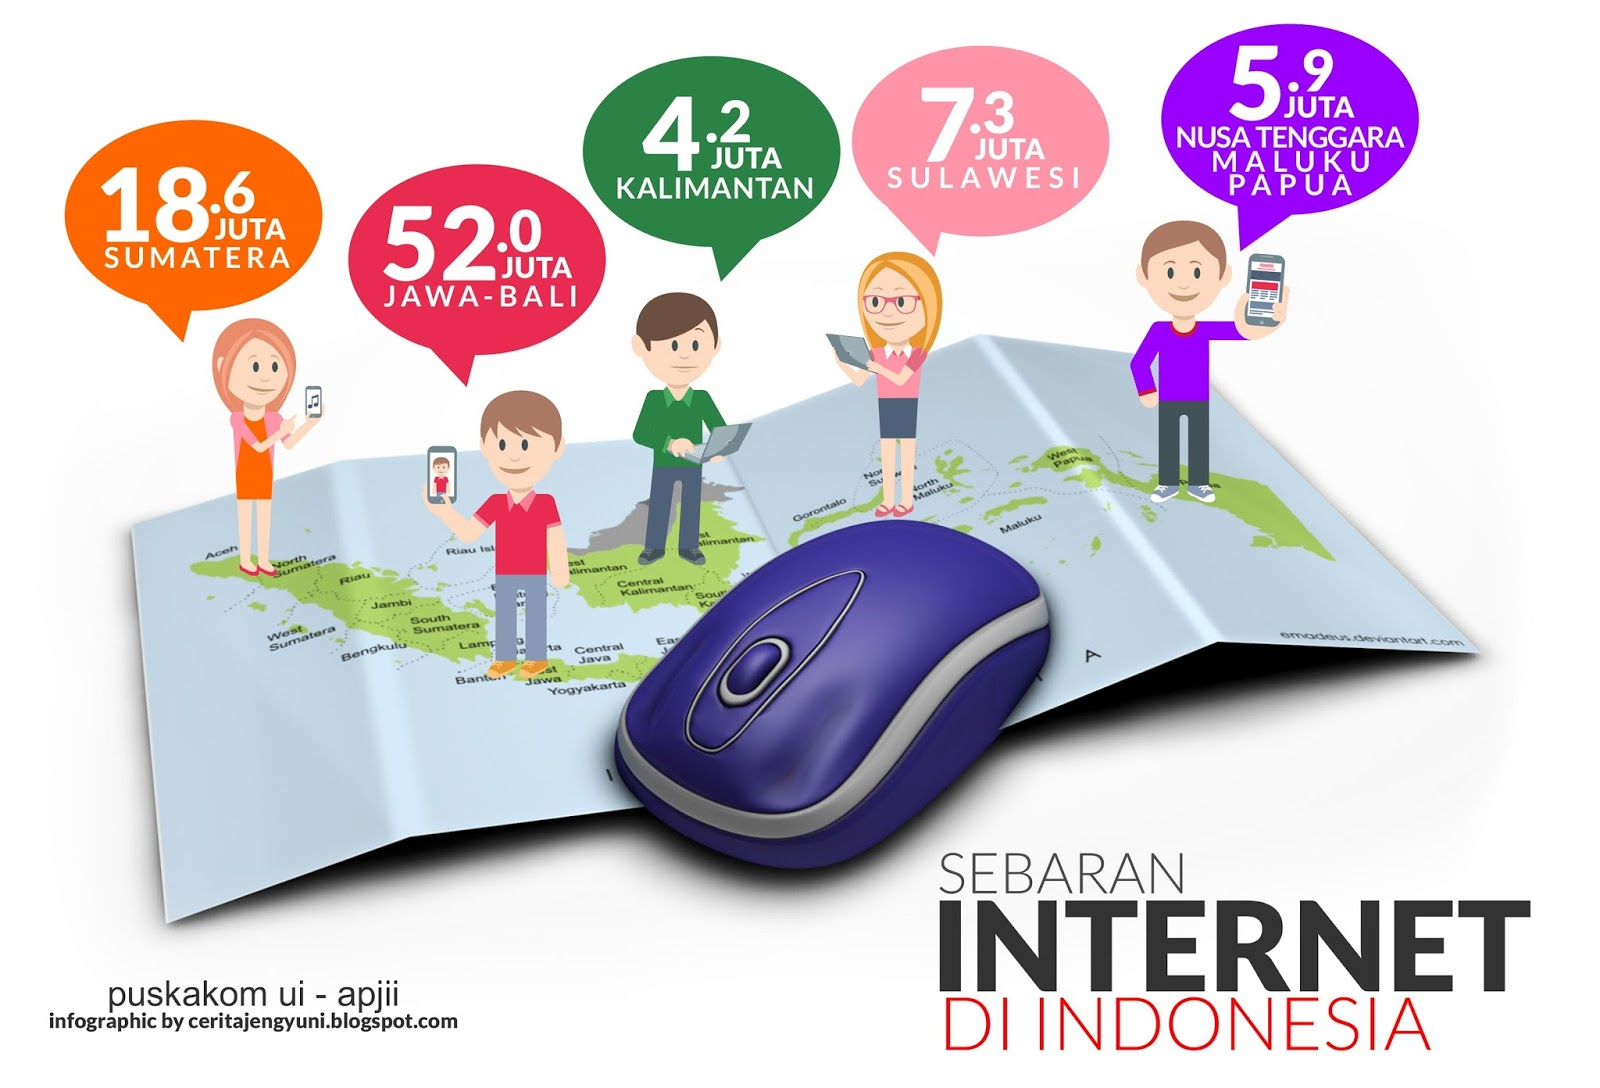 Sebaran Internet di Indonesia